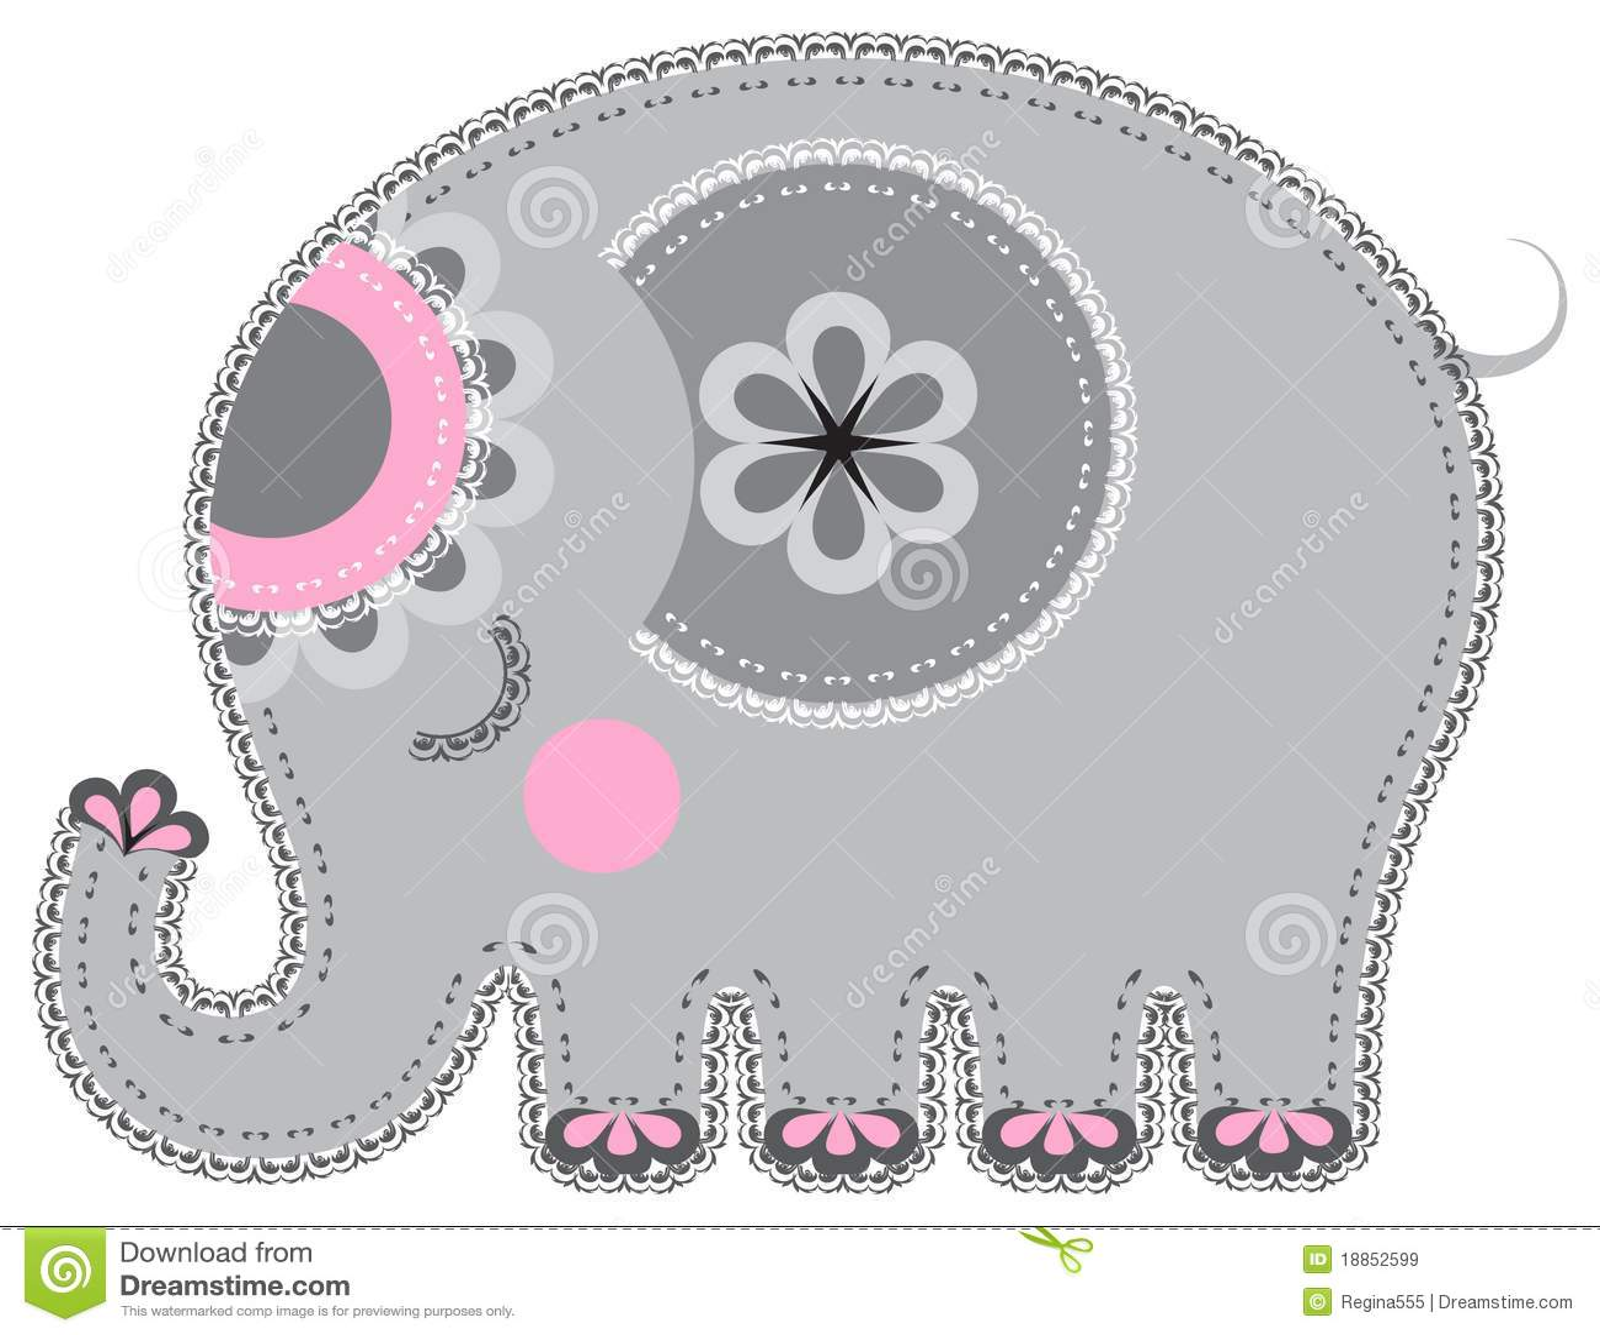 Fabric animal cutout. Elephant